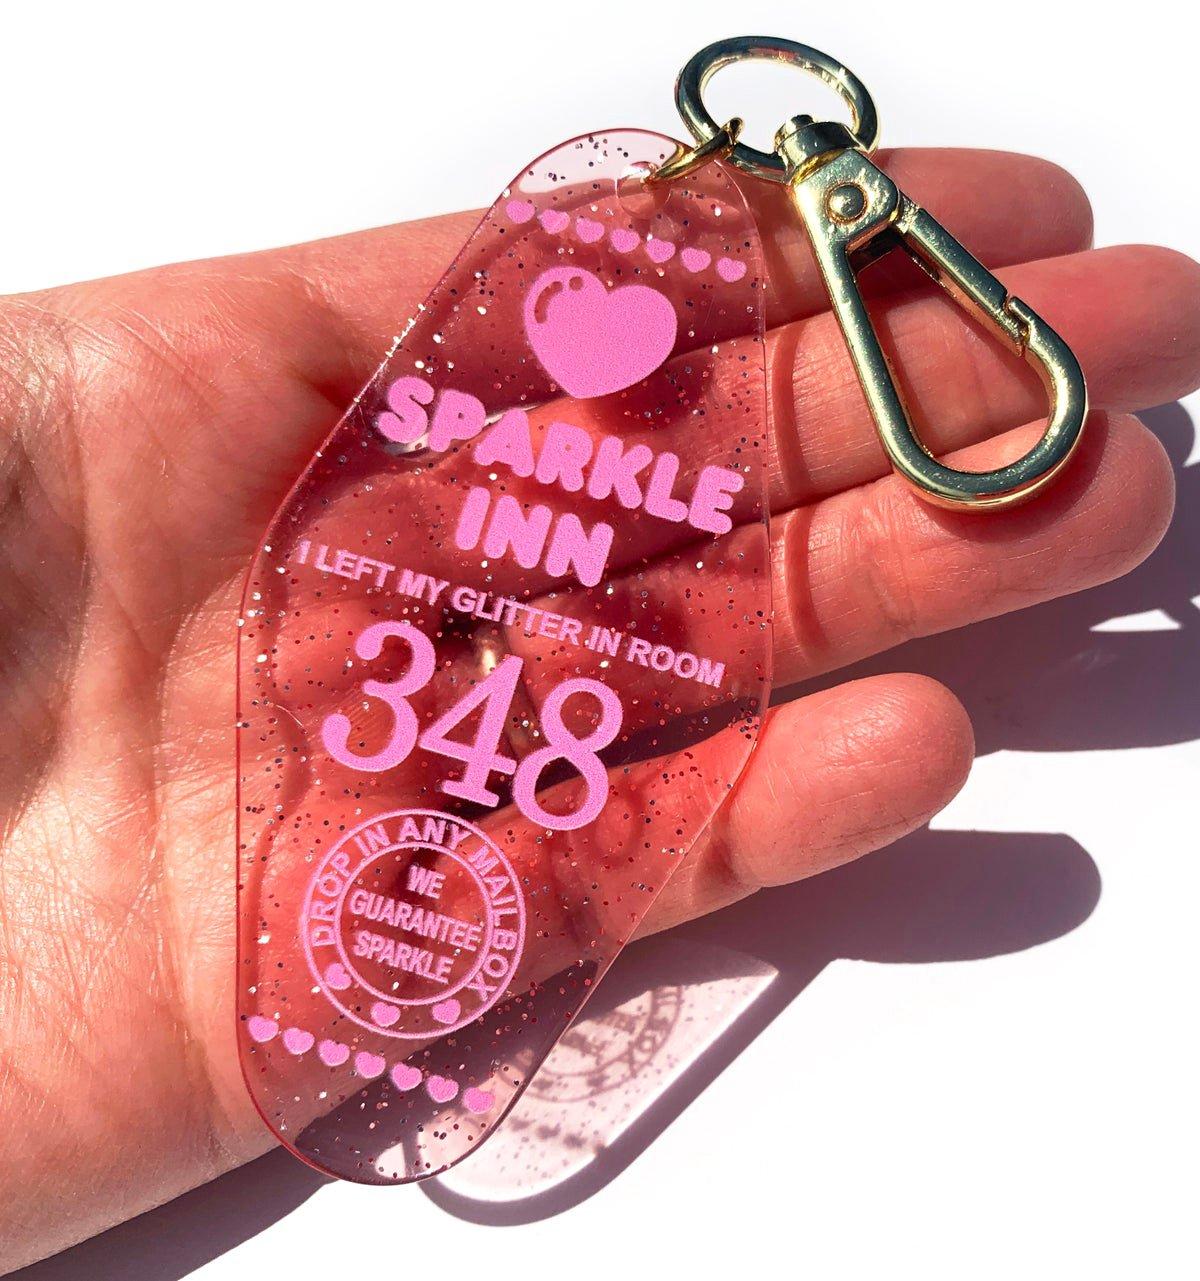 Image of Sparkle Inn Motel Bag Charm Keychain